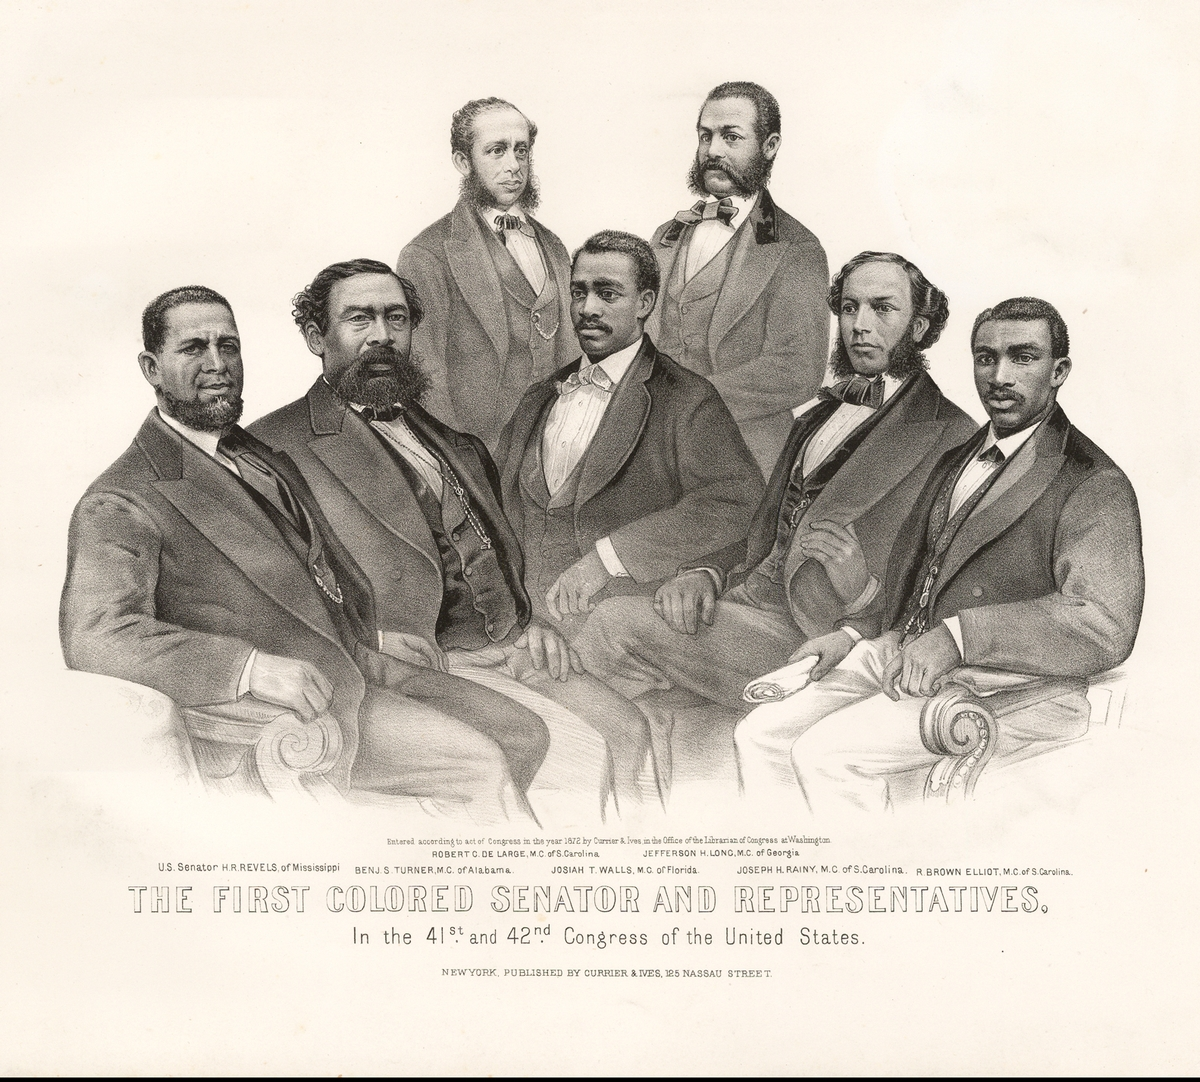 illustration : The First Colored Senator And Representatives